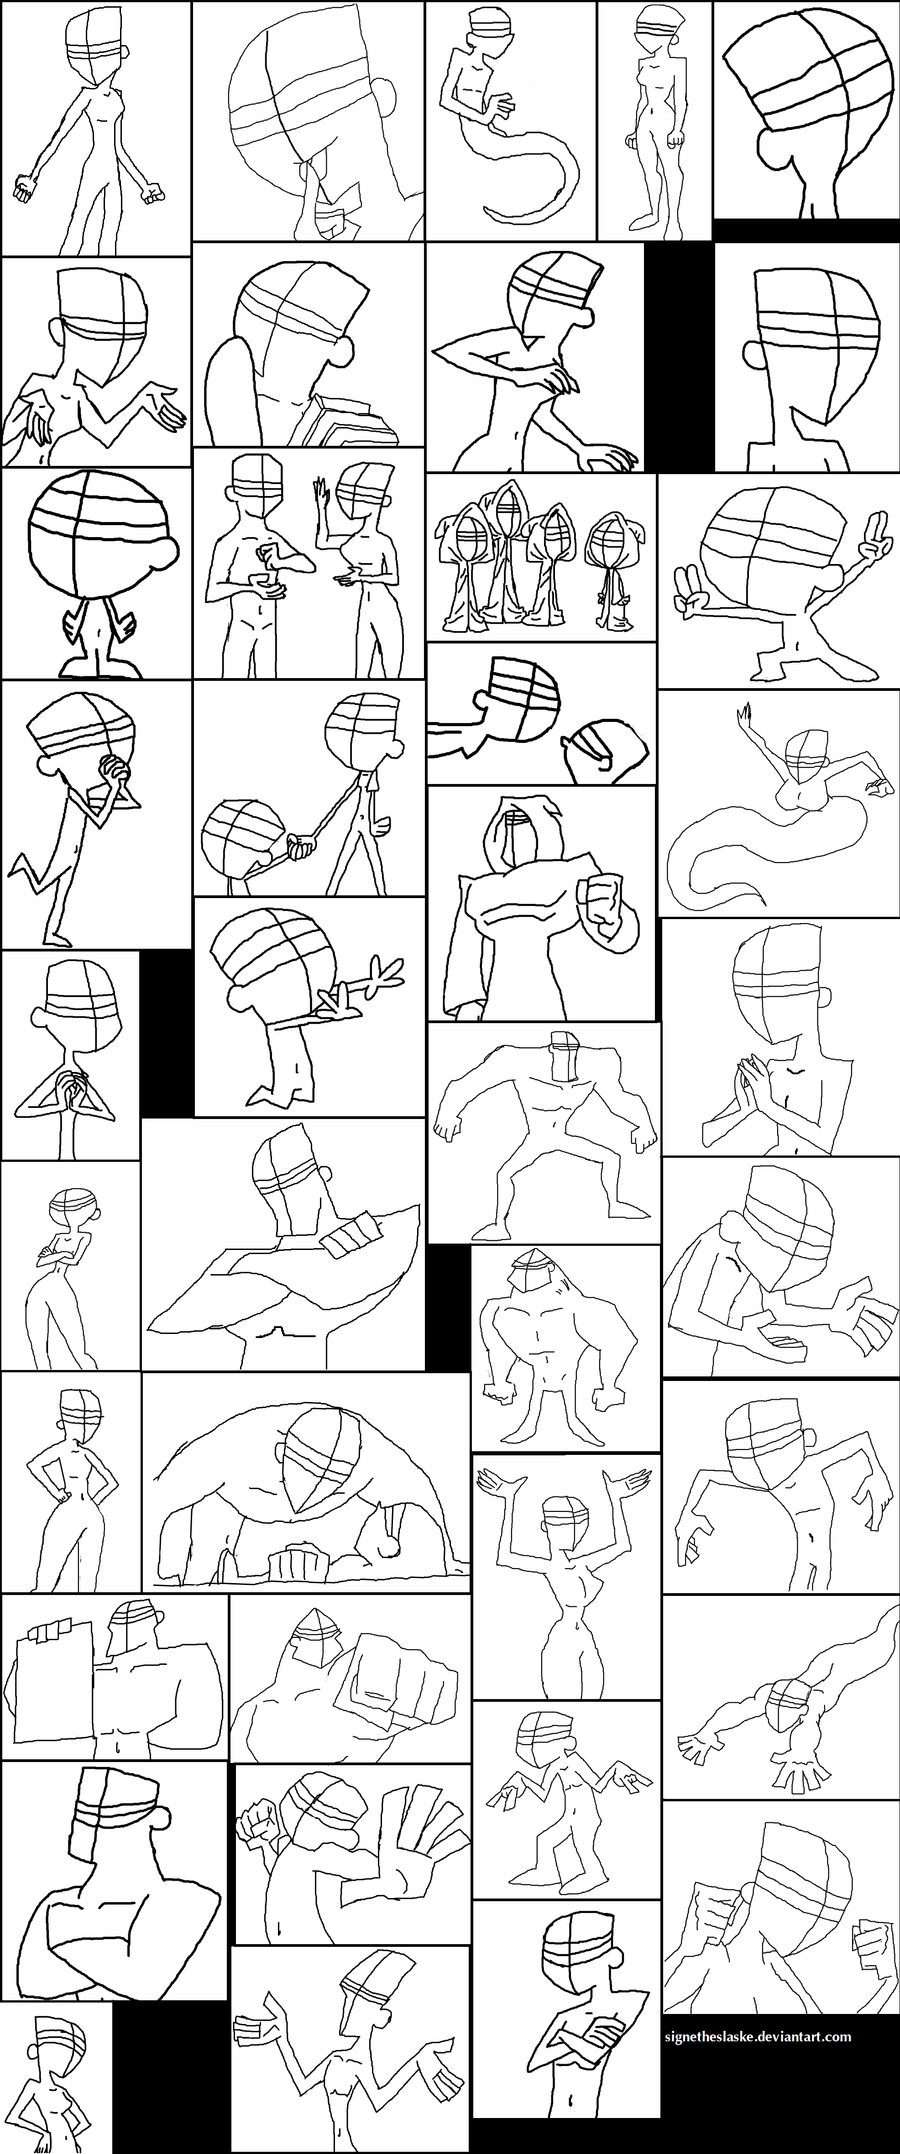 Butch Hartman helping-sketches by SigneTheSlaske